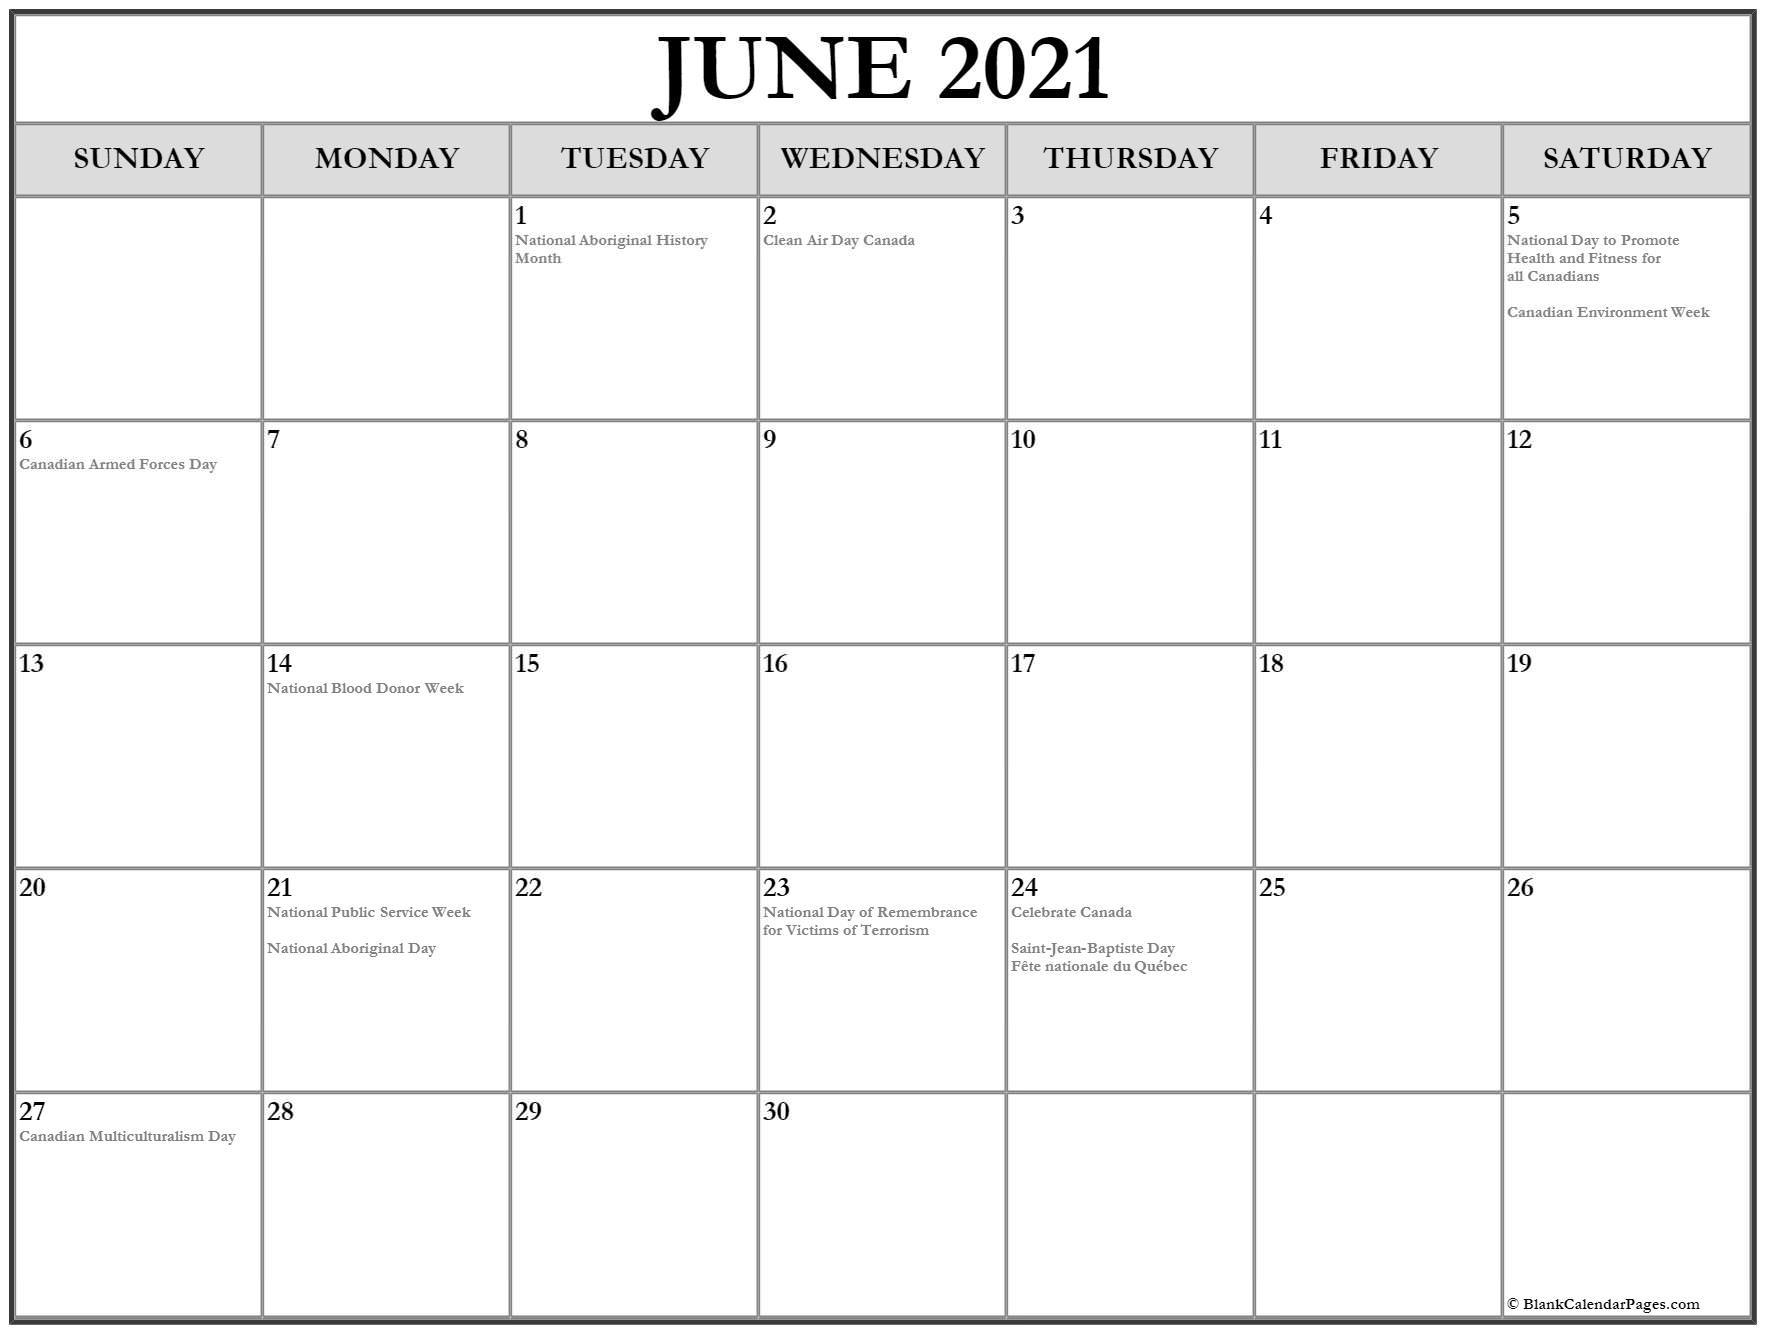 June 2021 Calendar With Holidays June 2021 Calendar With Holidays Usa